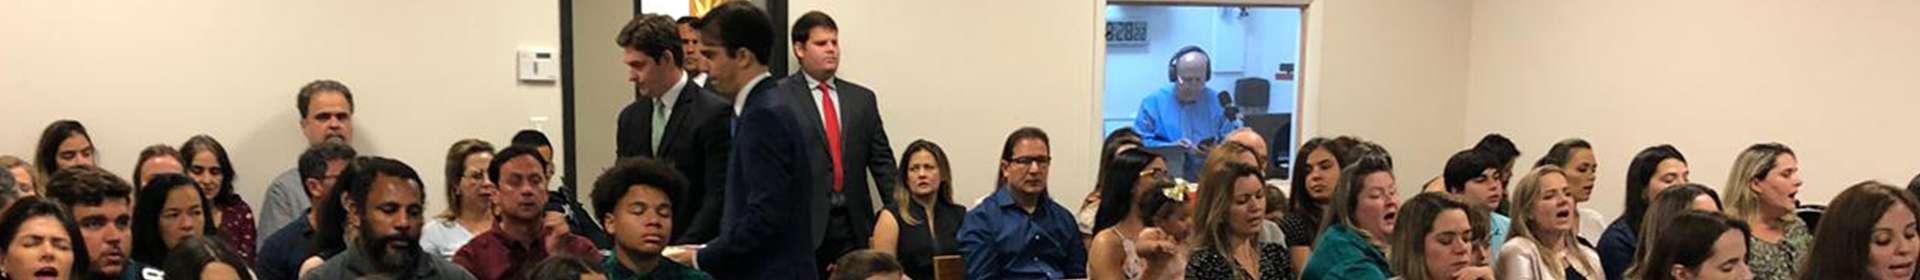 Culto de ceia na Flórida, EUA, reúne membros da Igreja Cristã Maranata